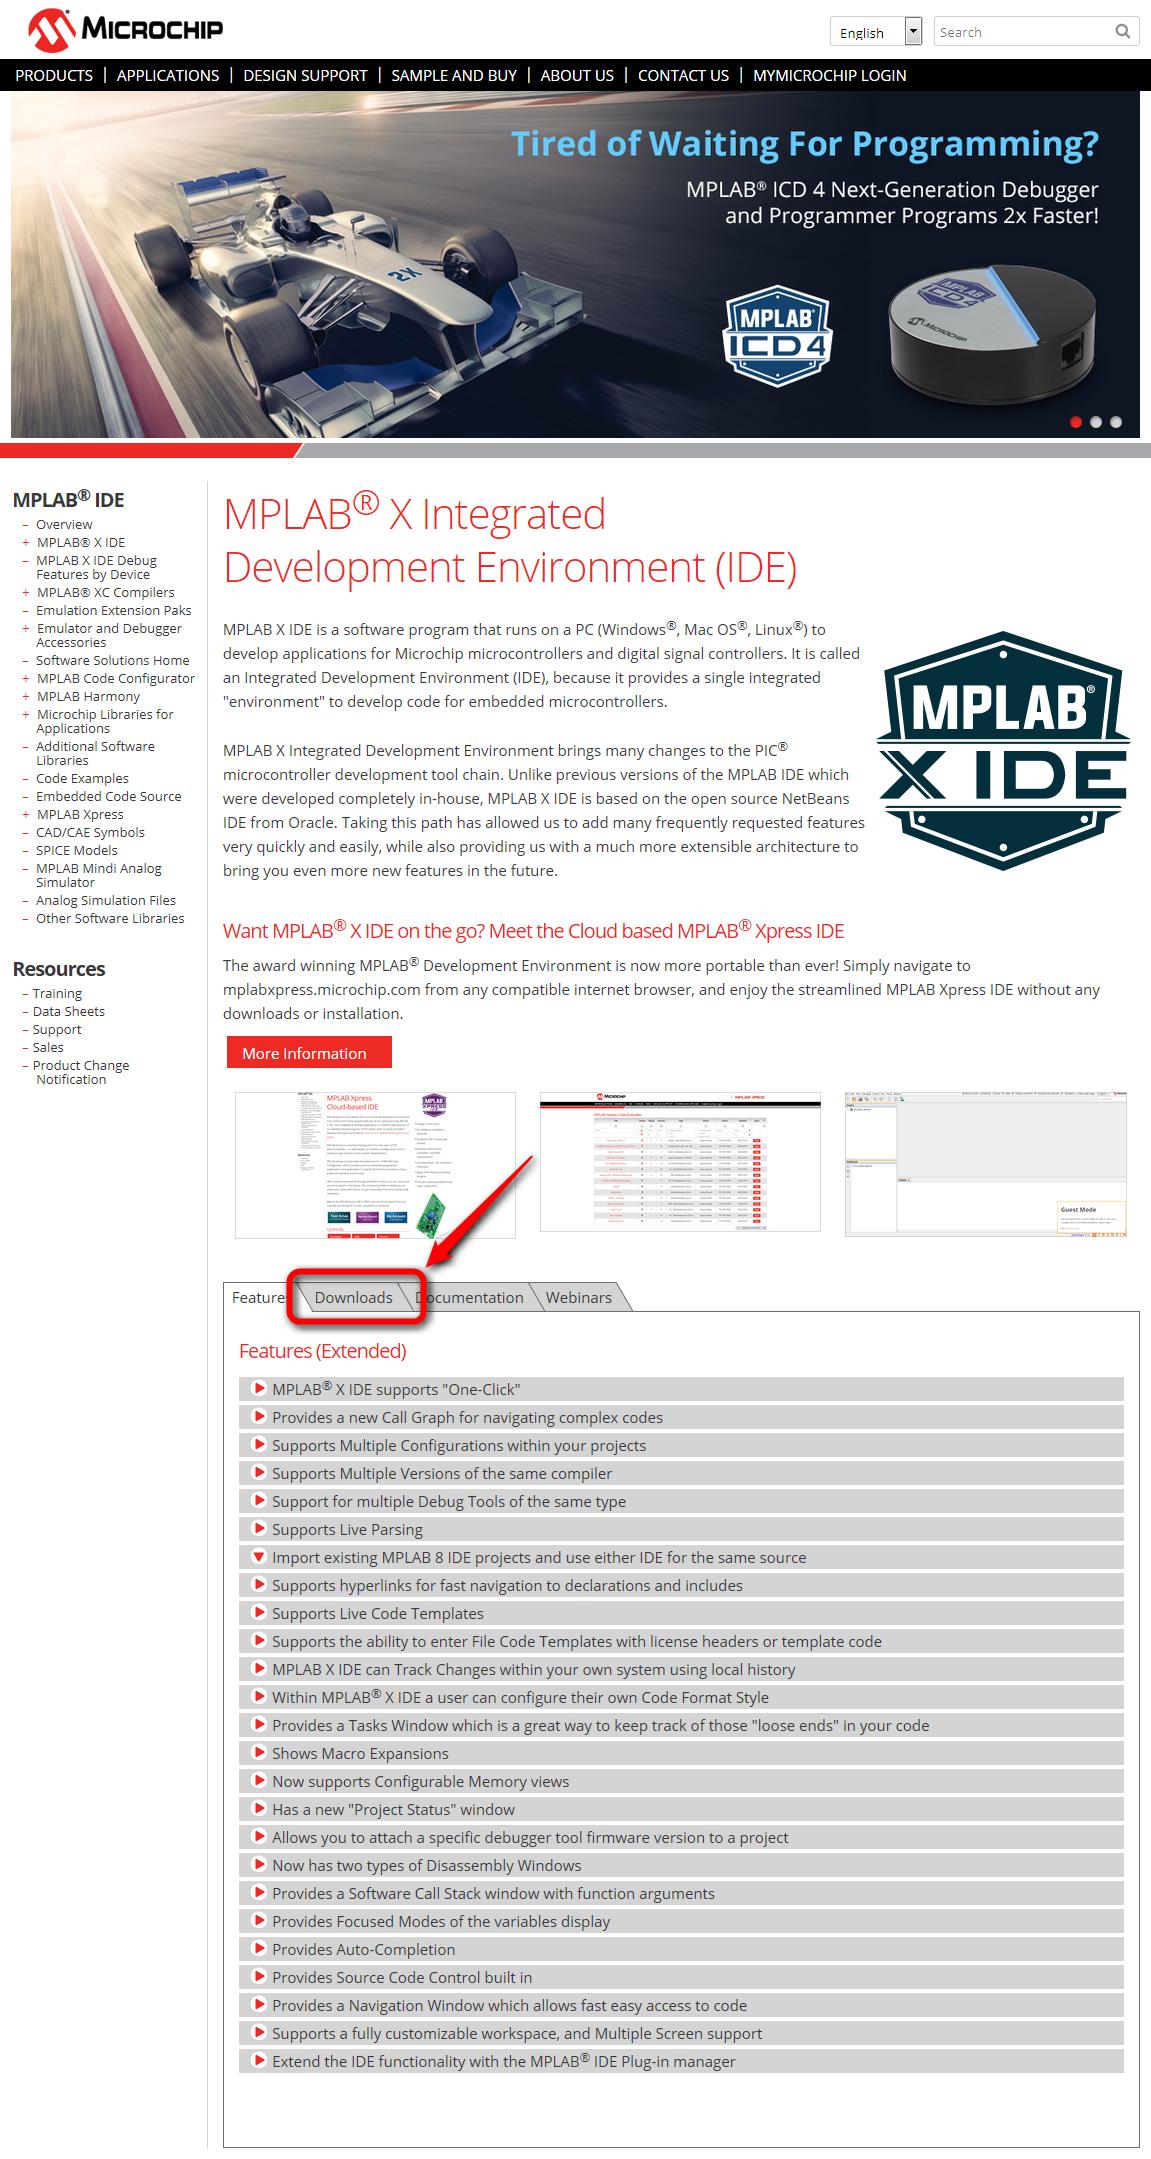 MPLAB X IDEのインストール方法【Windows編】 | PICマイコン Lab